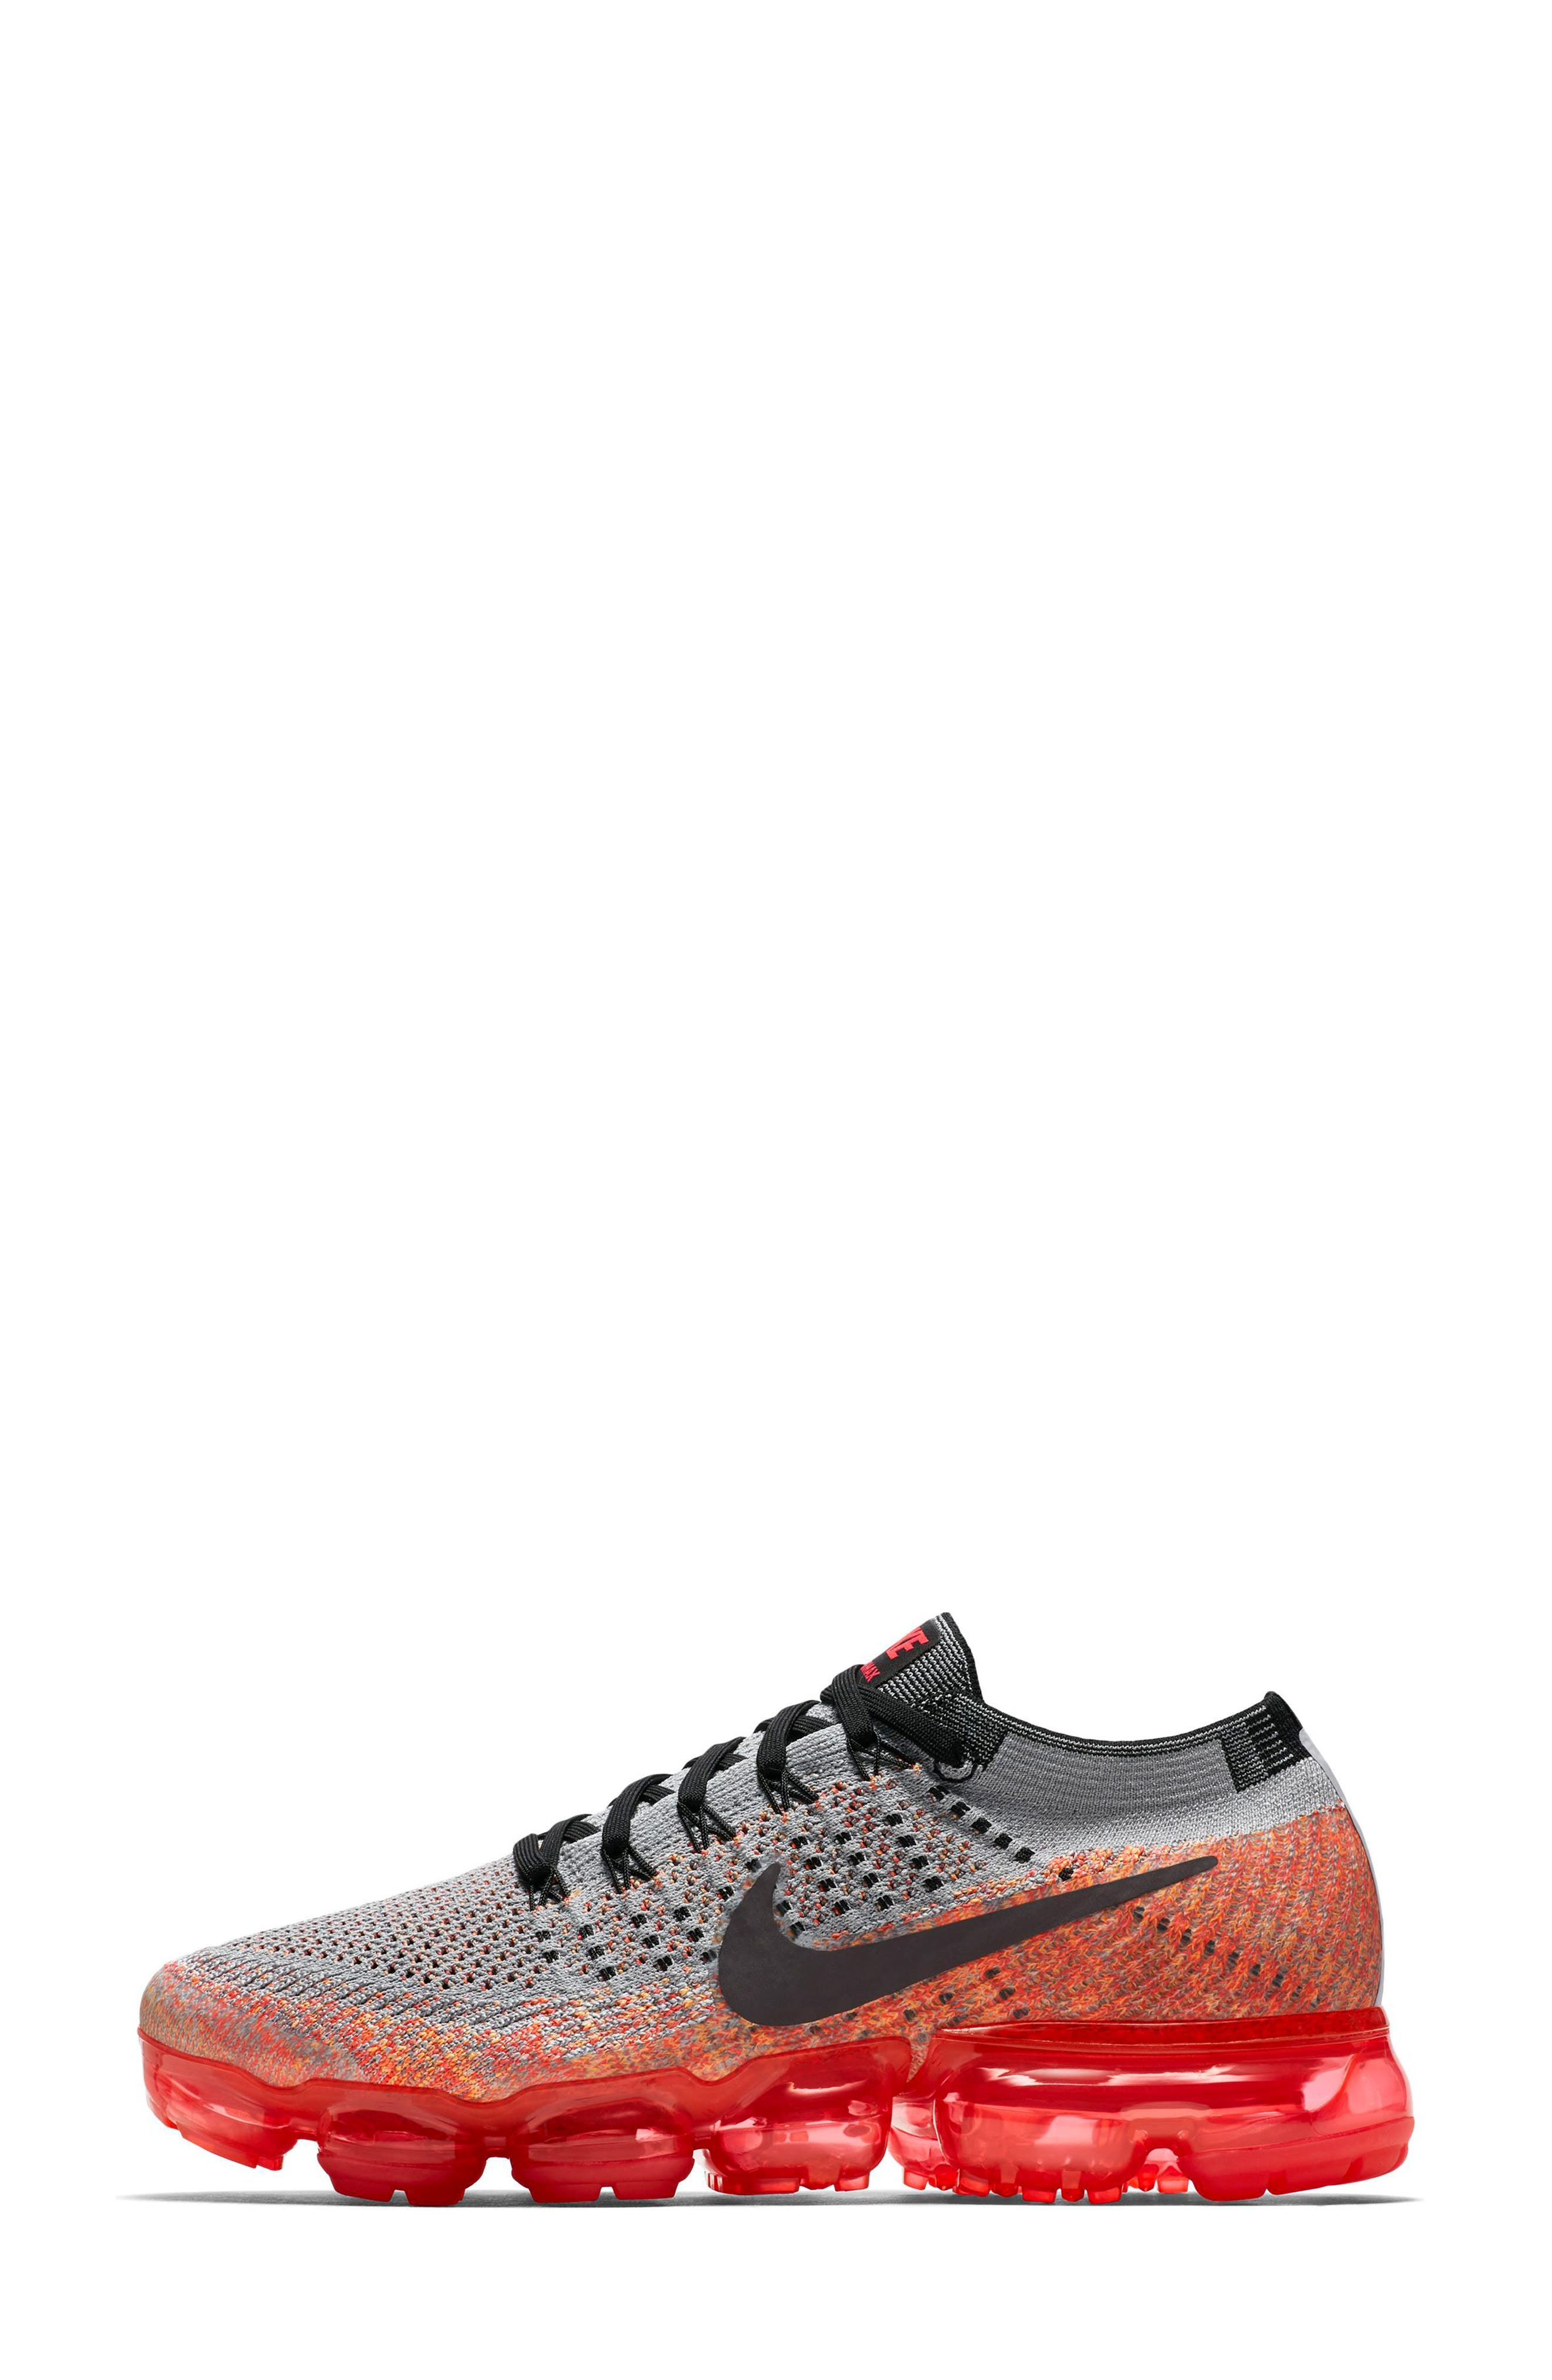 Air VaporMax Flyknit Running Shoe,                             Alternate thumbnail 2, color,                             Wolf Grey/ Black